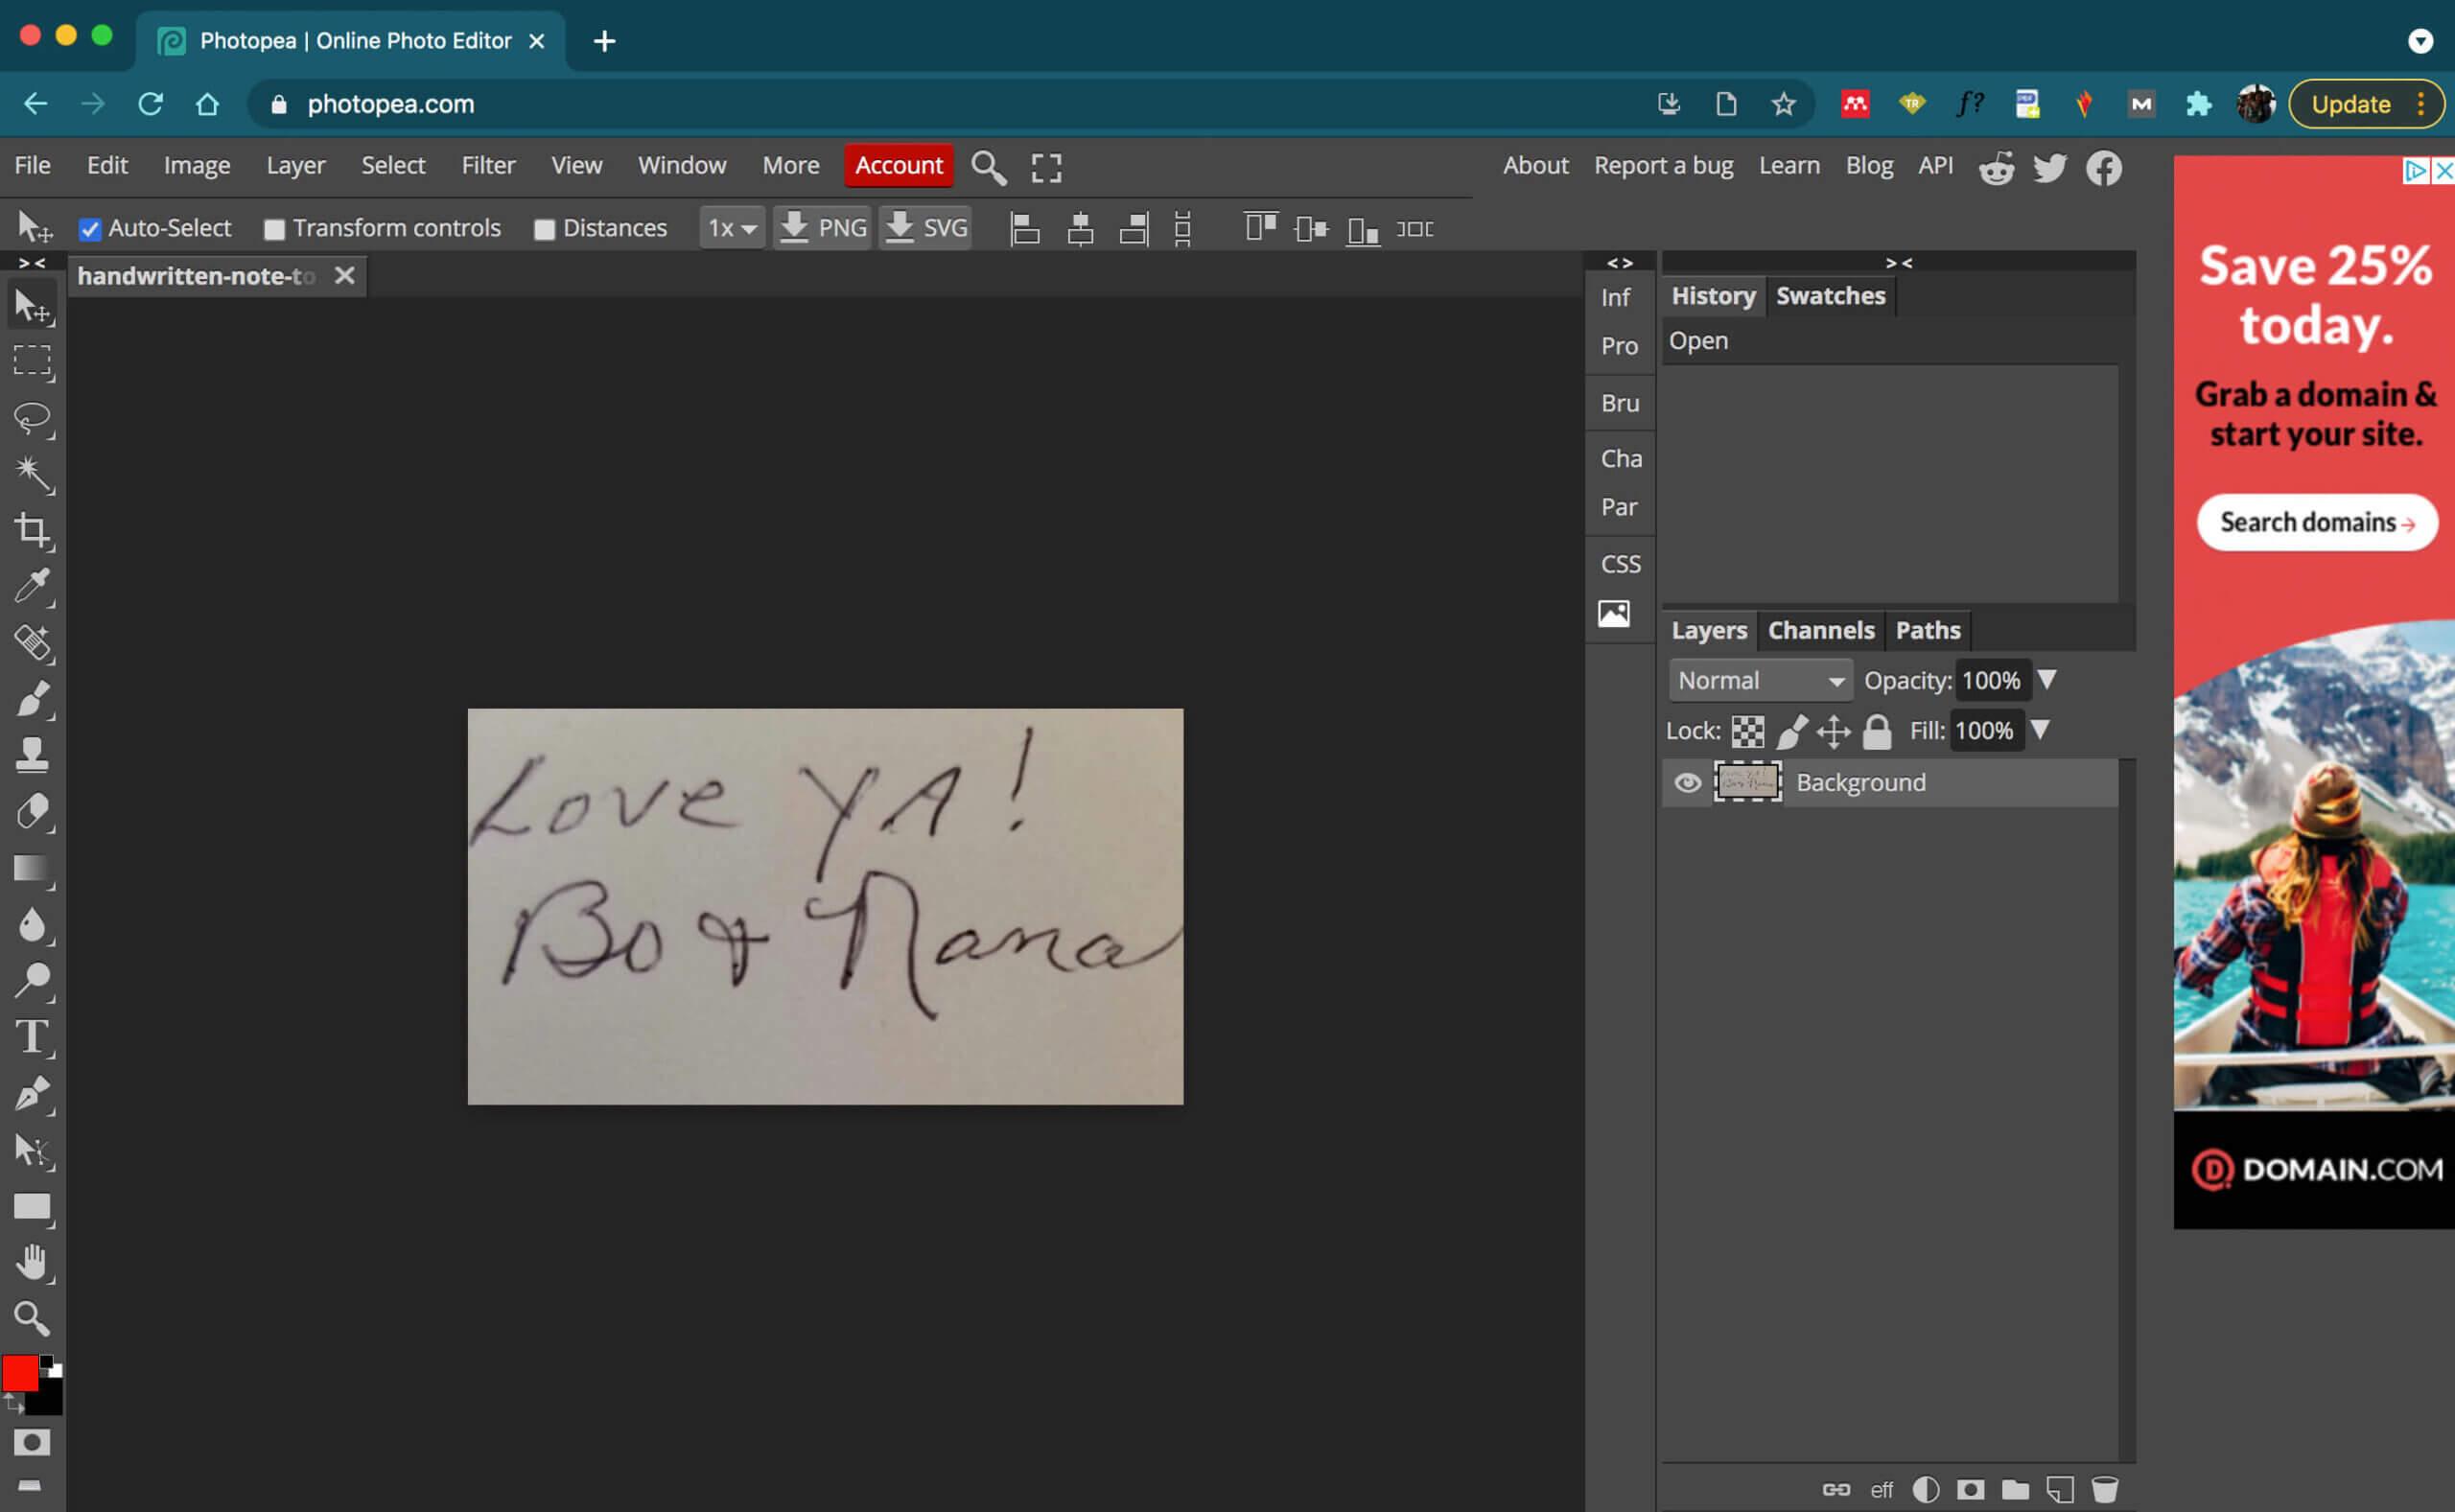 original handwriting image in Photopea